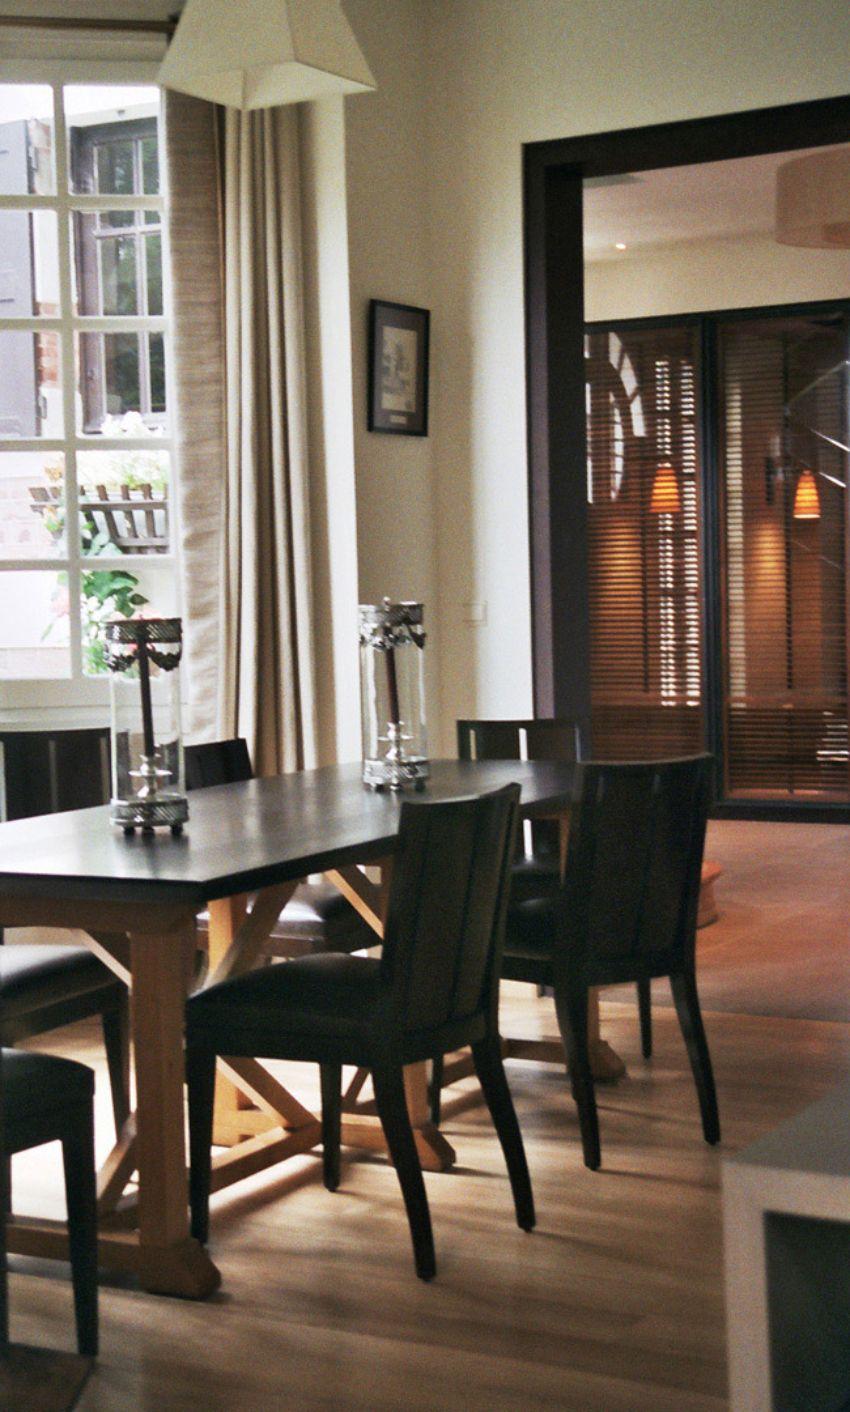 Striking Dining Rooms To Inspire You Designed by BISMUT & BISMUT